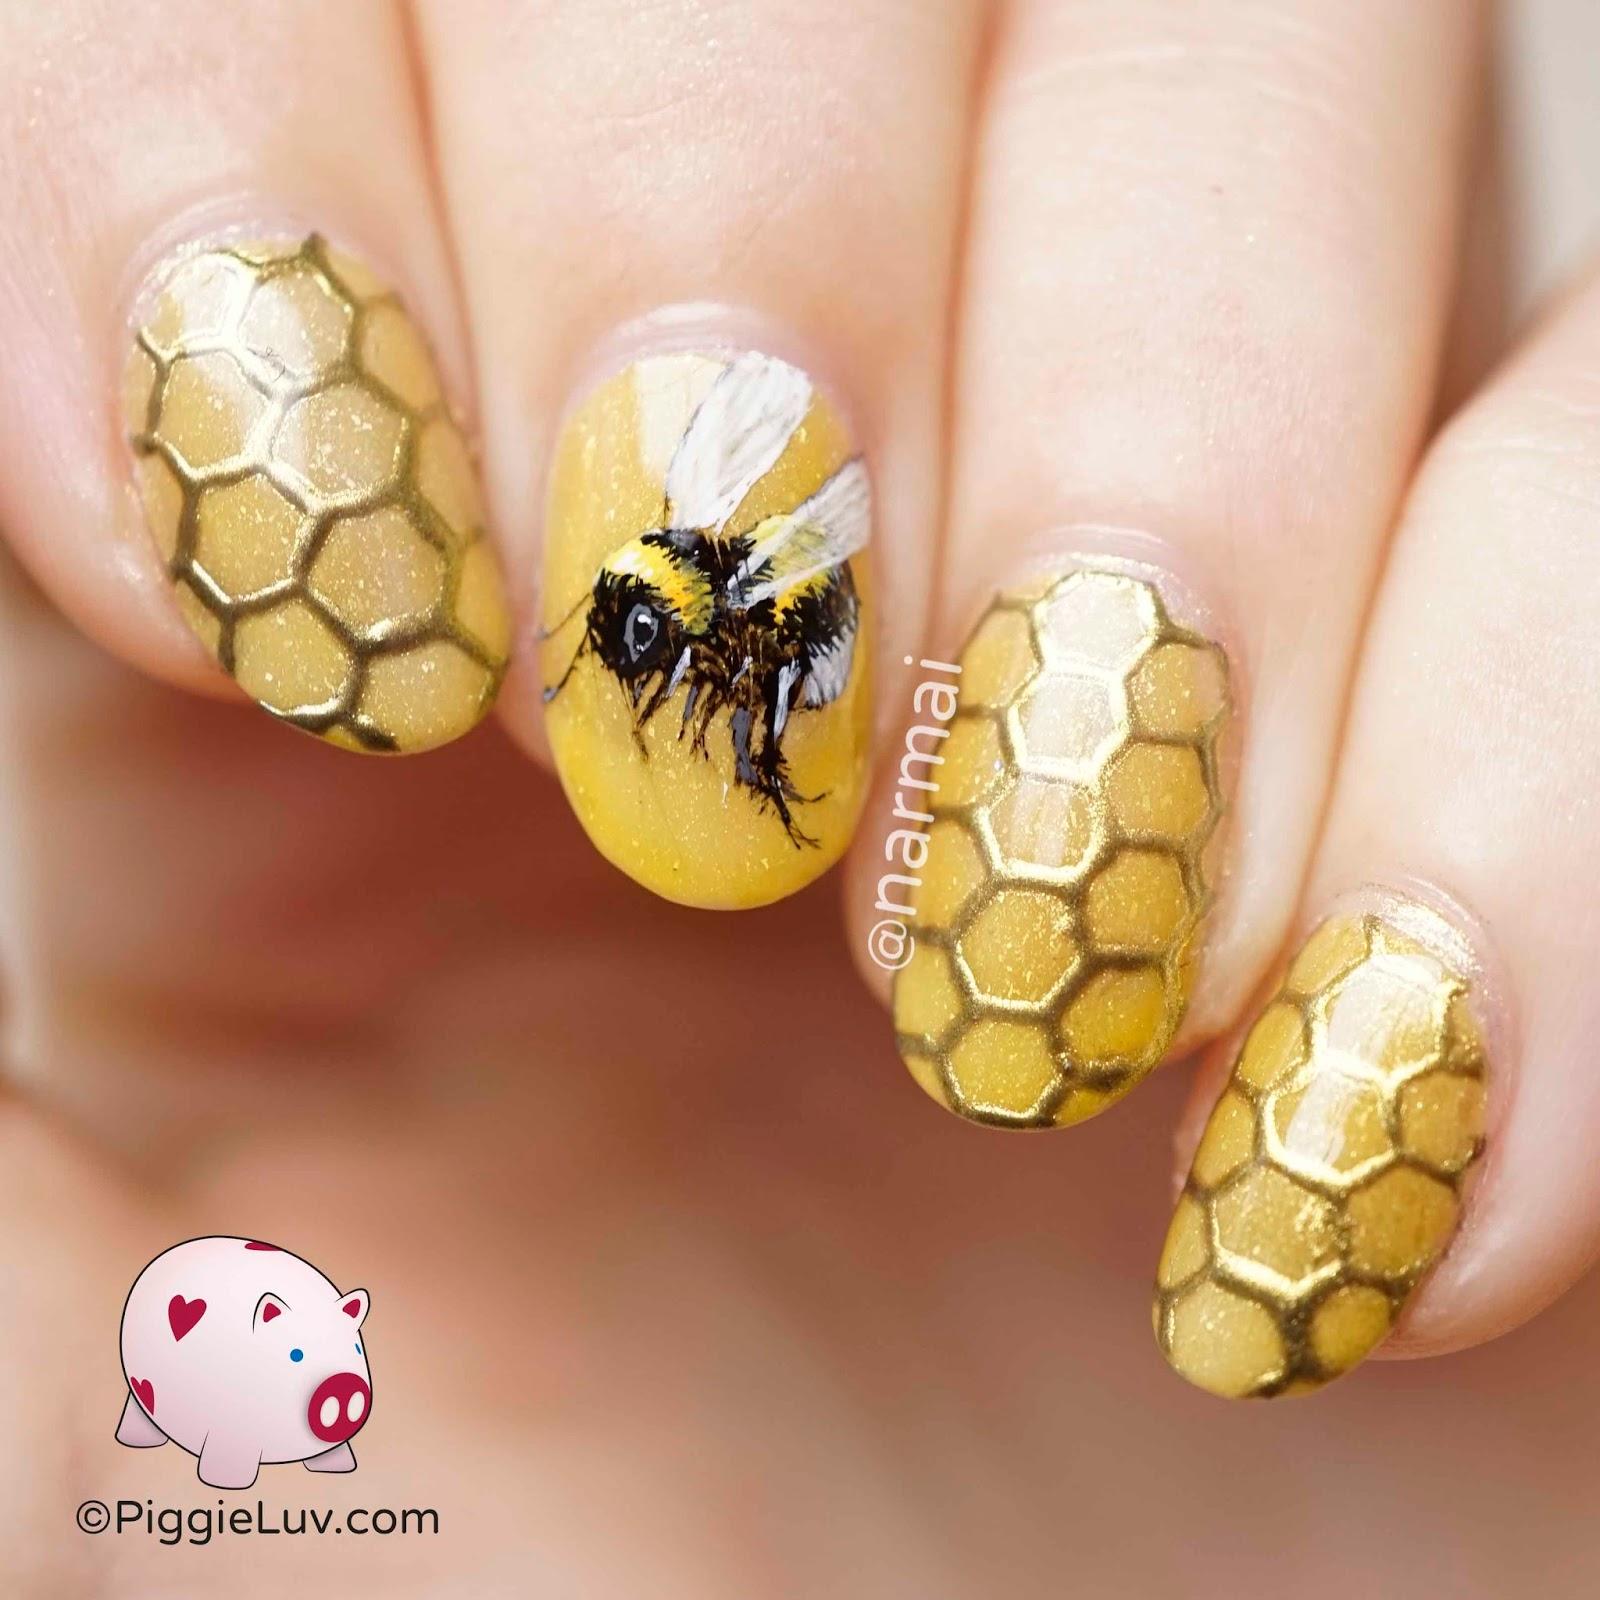 PiggieLuv: Honeybee chrome nail art